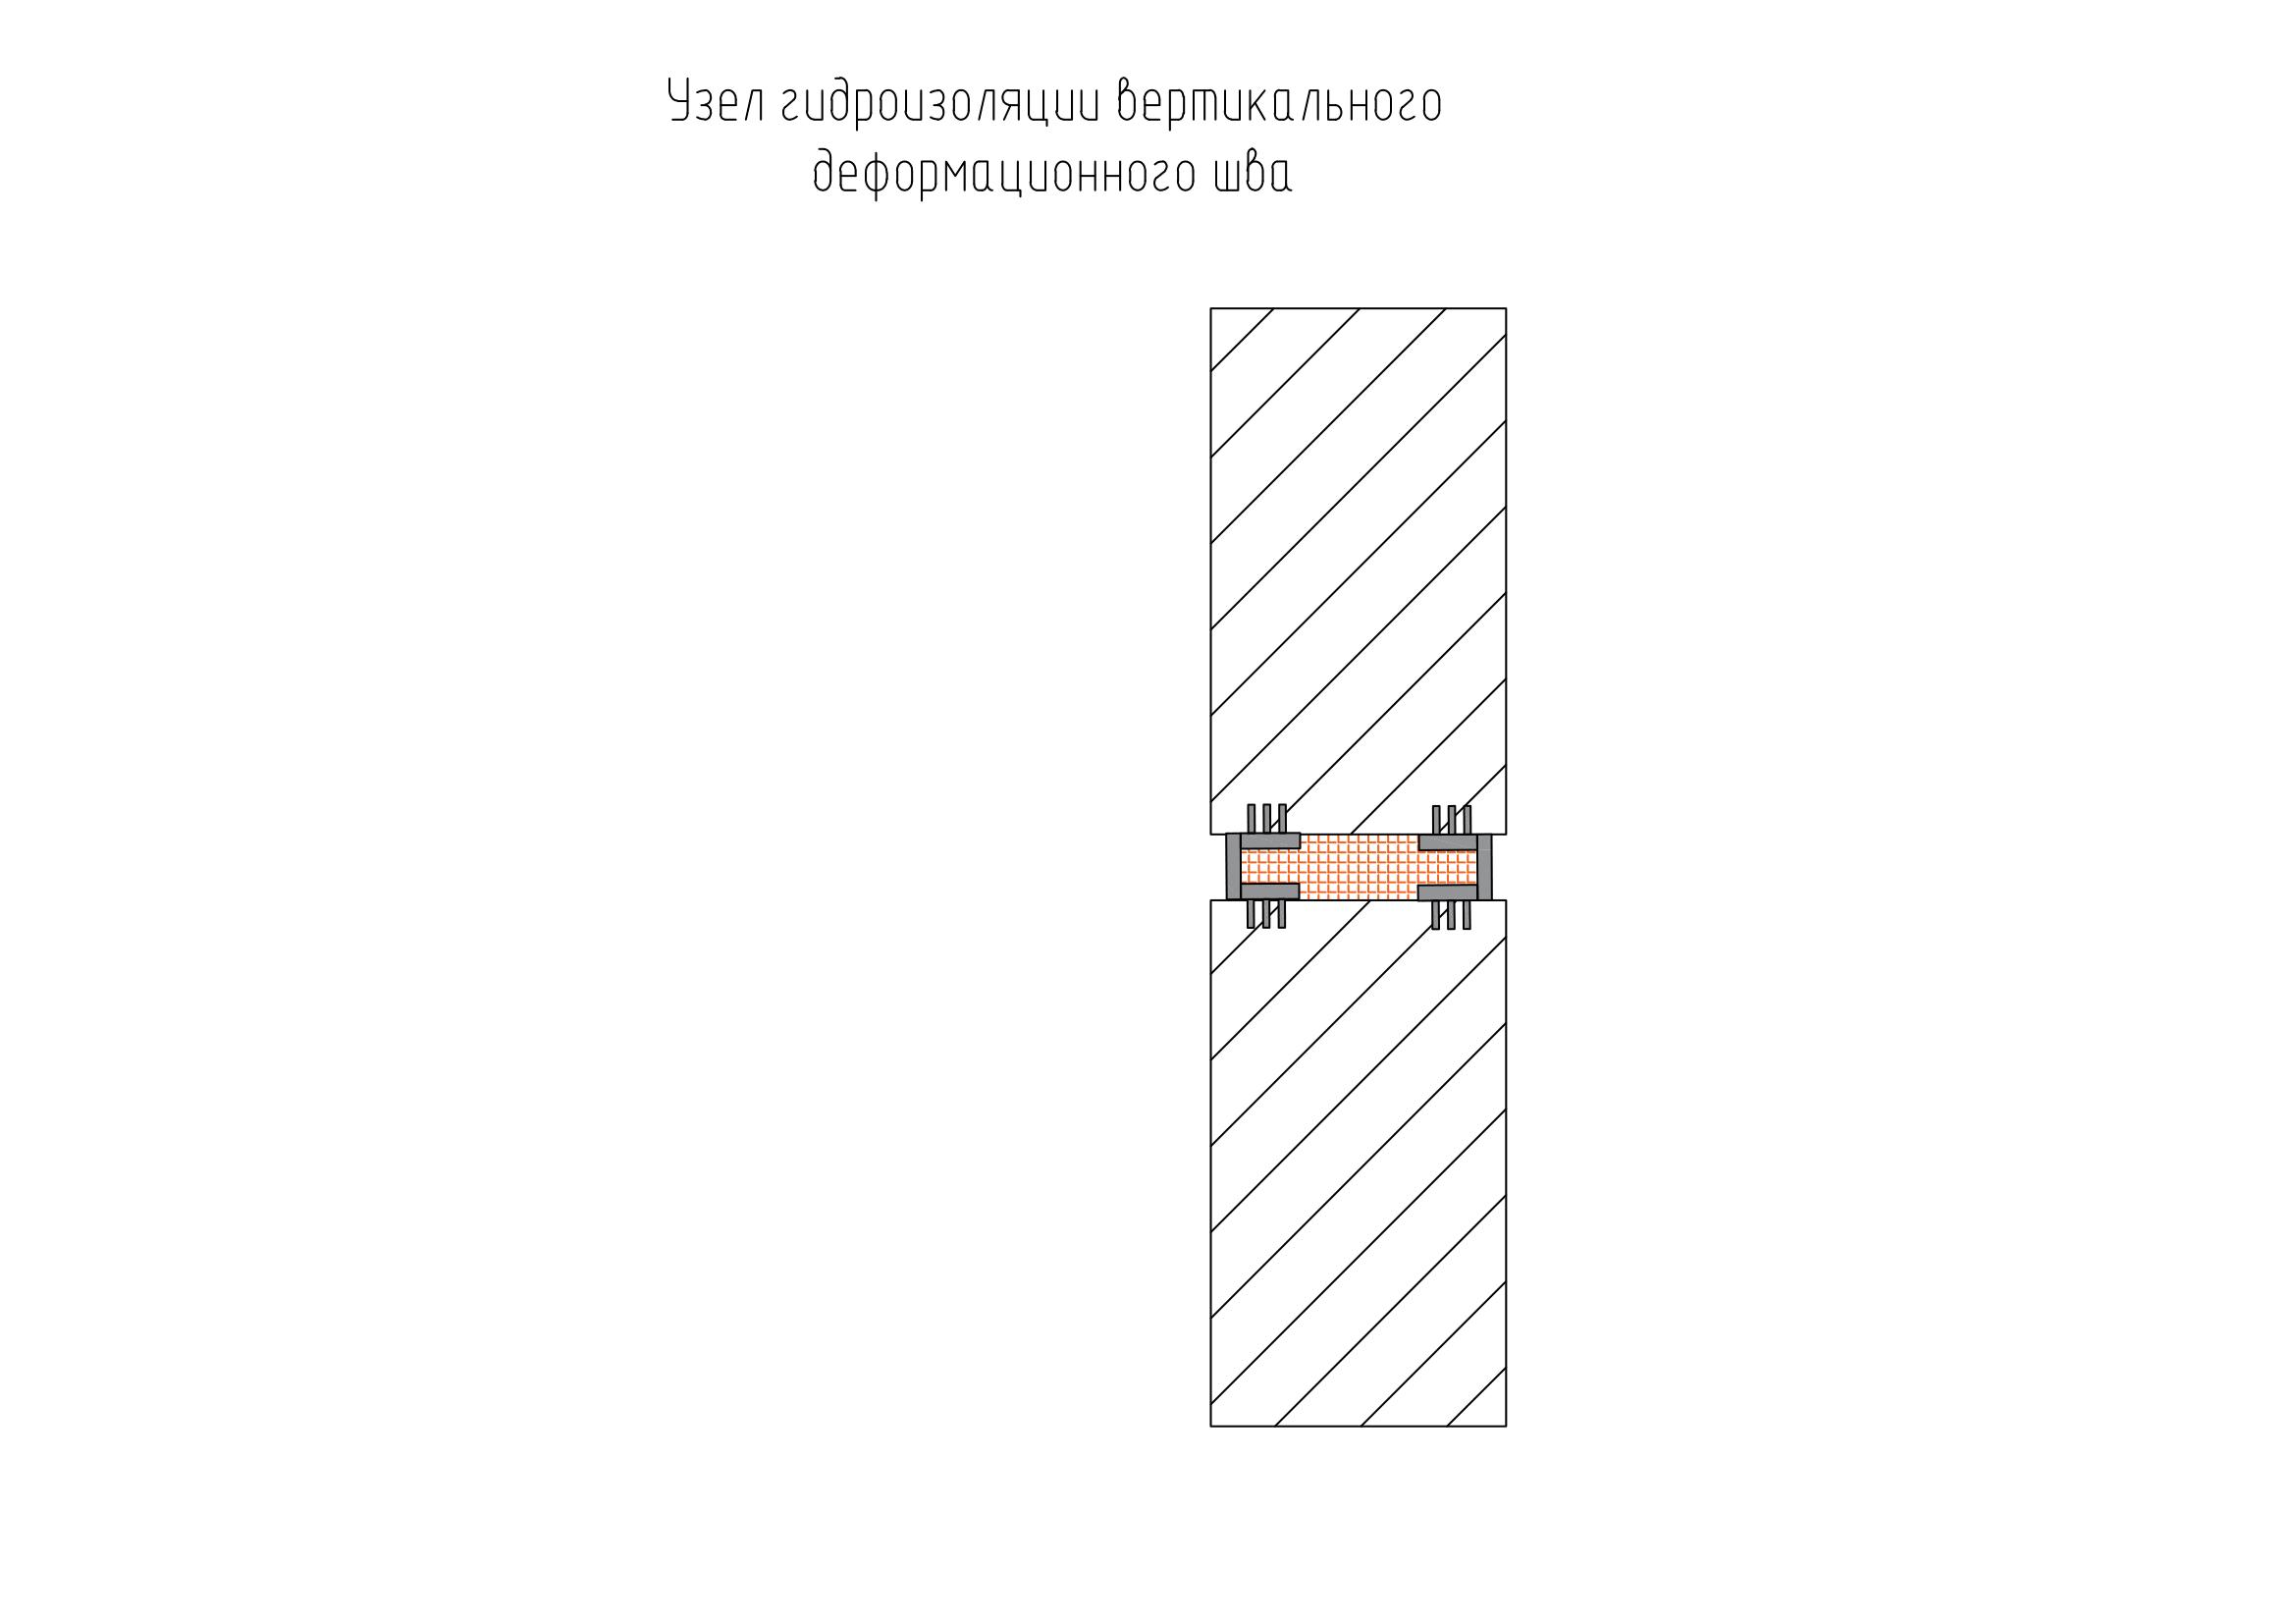 разрез деформационного шва-1